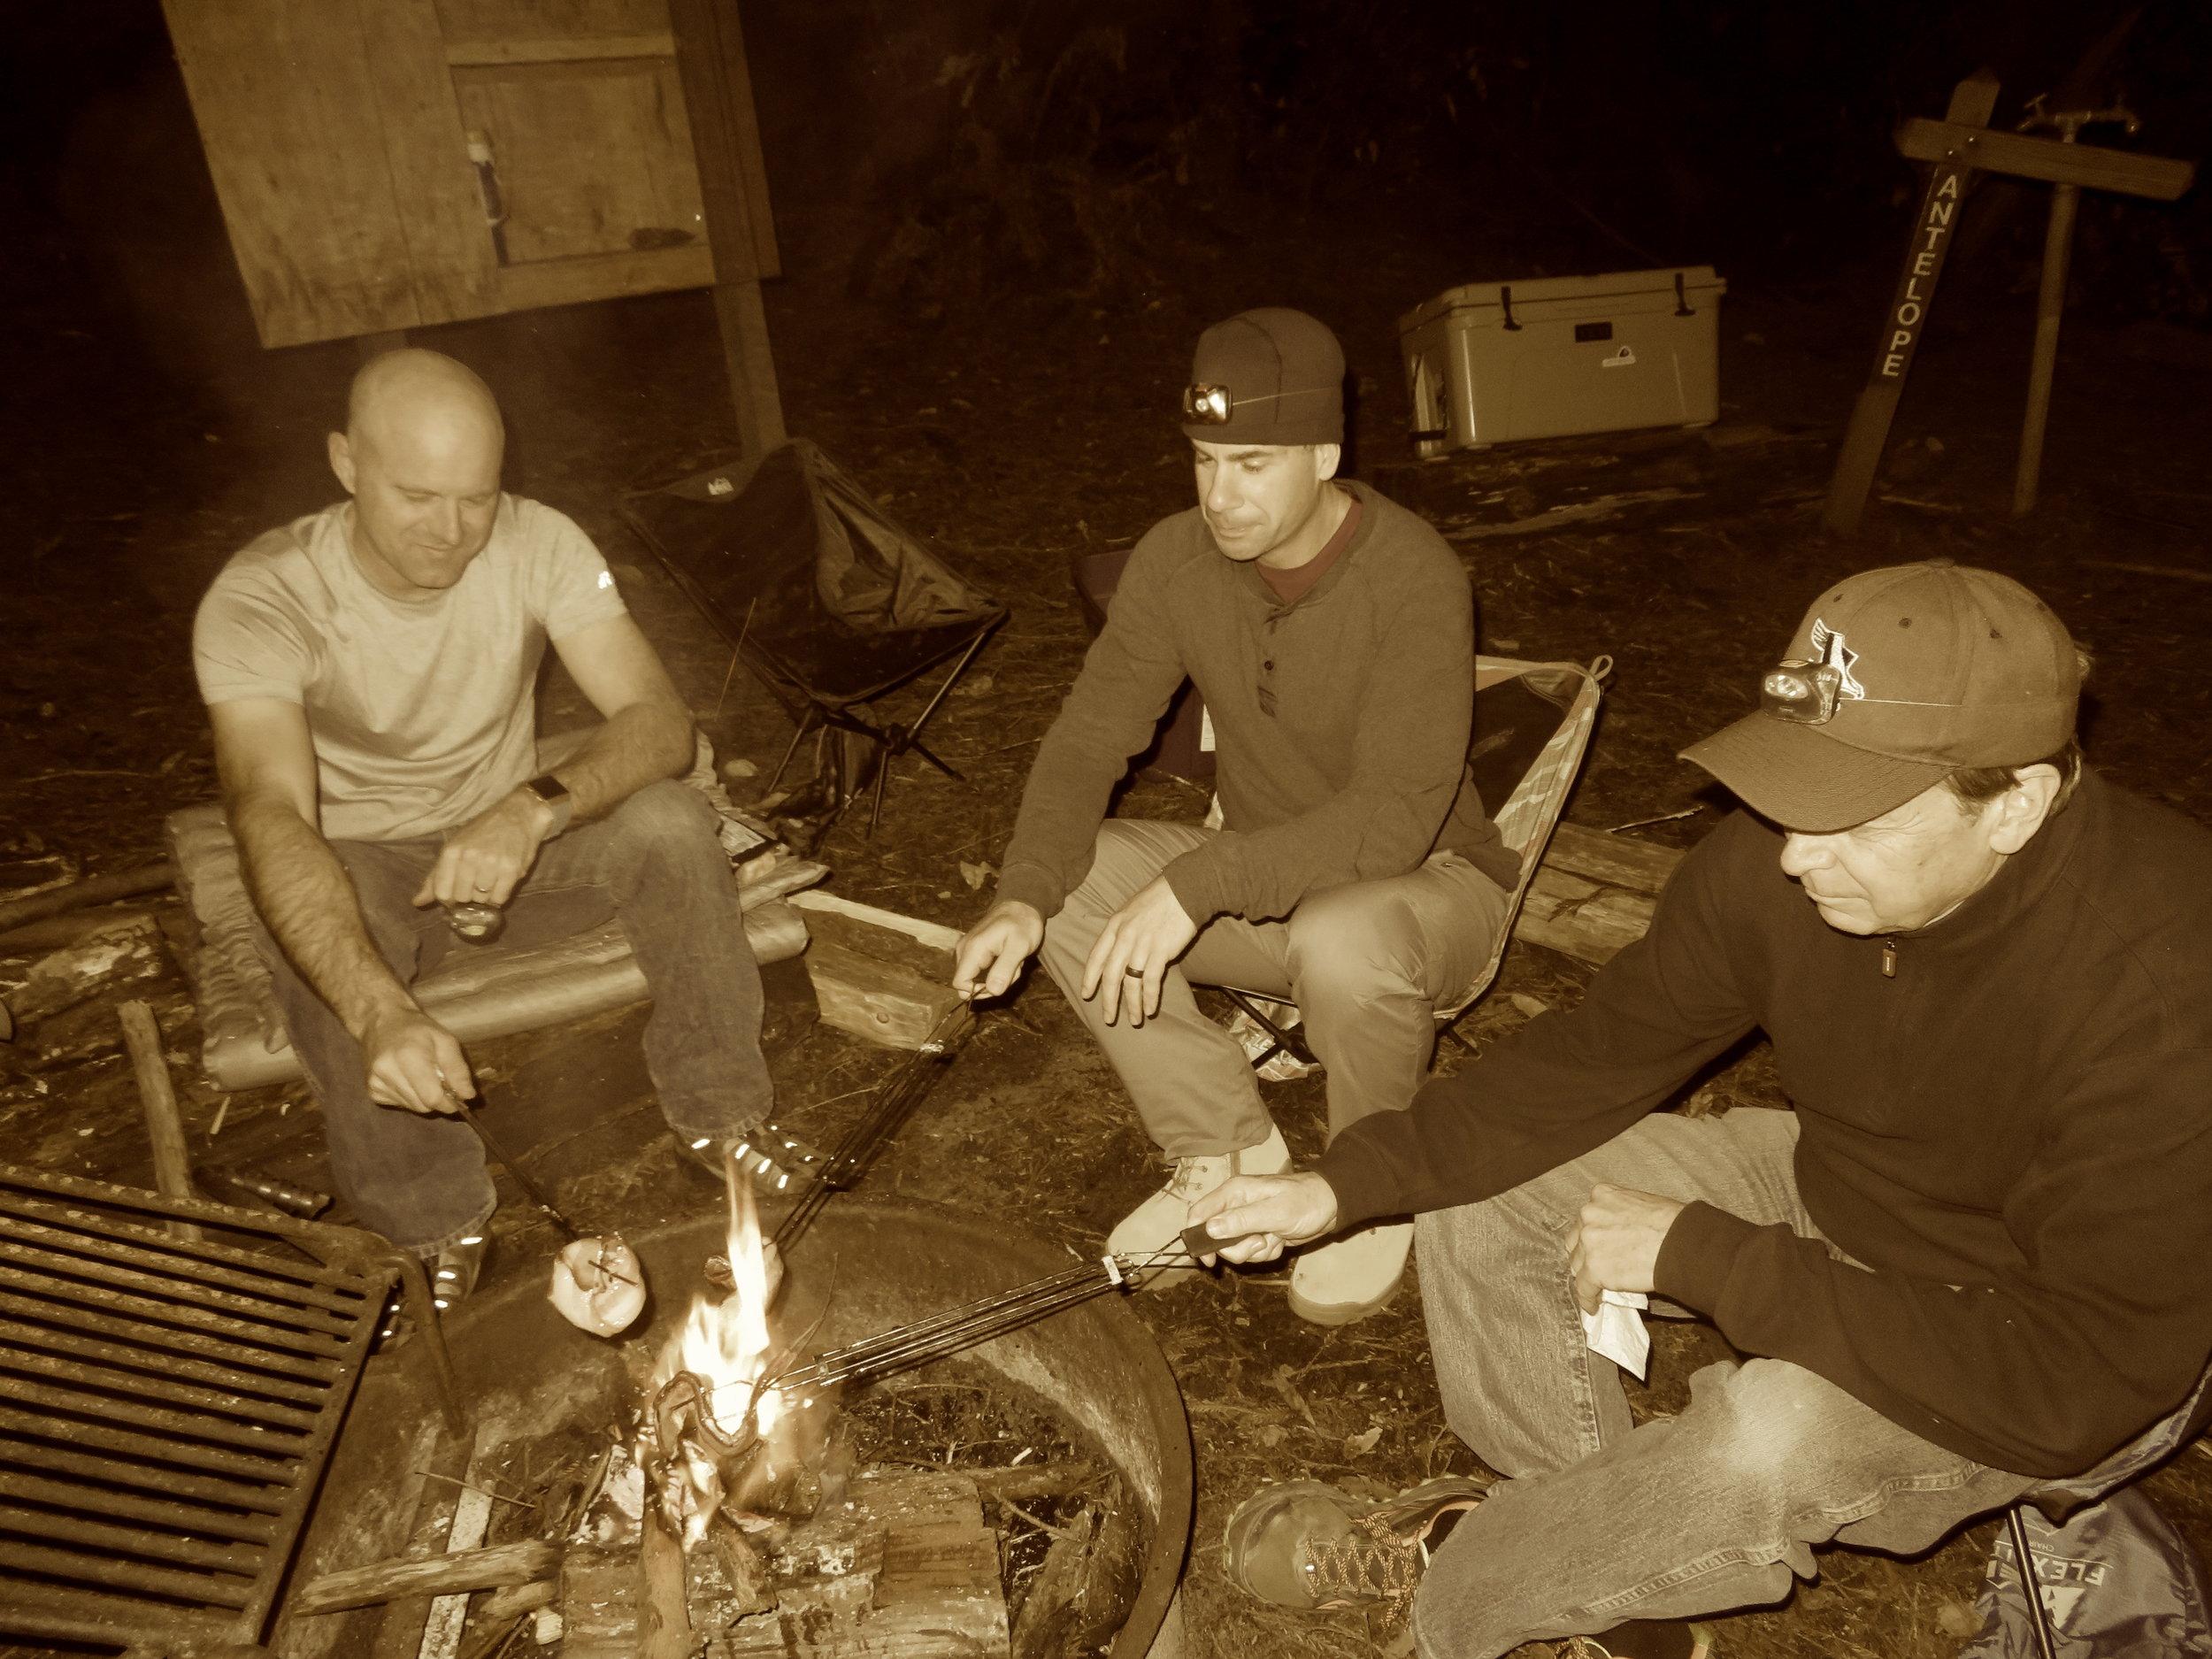 HQ Redwoods fire pat bill joe outdoors bacon land excursion STG 001IMG_0041 (4).JPG